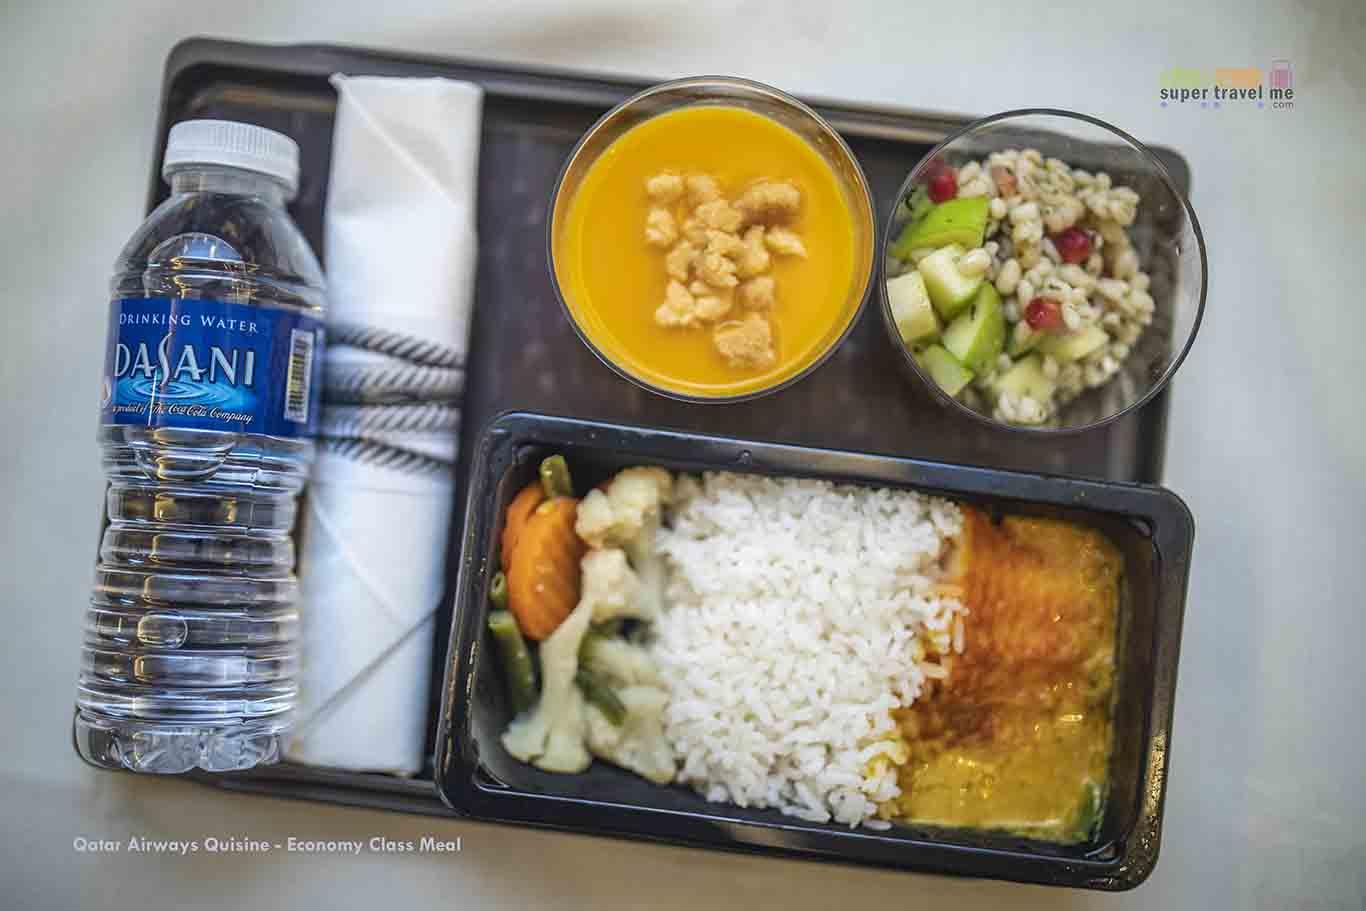 Qatar Airways Quisine Economy Class Meal Presentation